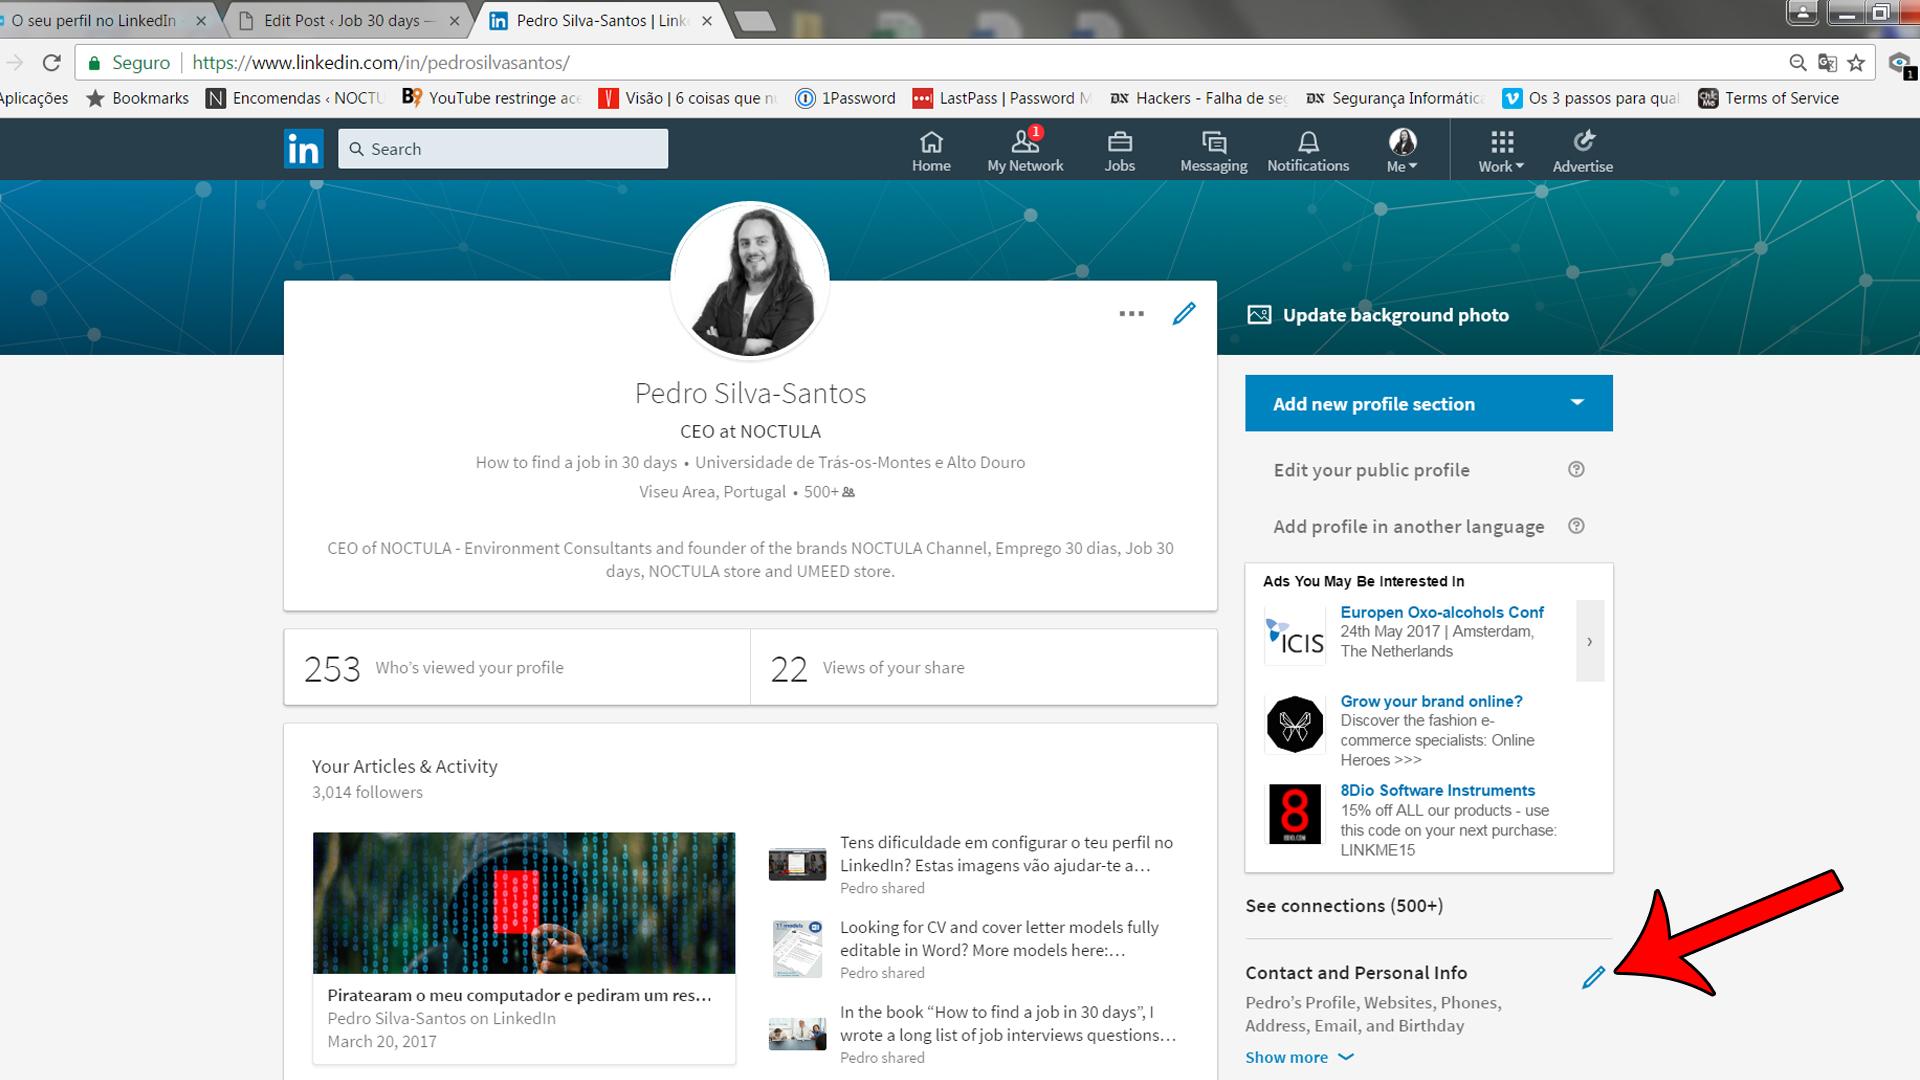 Setting up a profile on LinkedIn_02a1